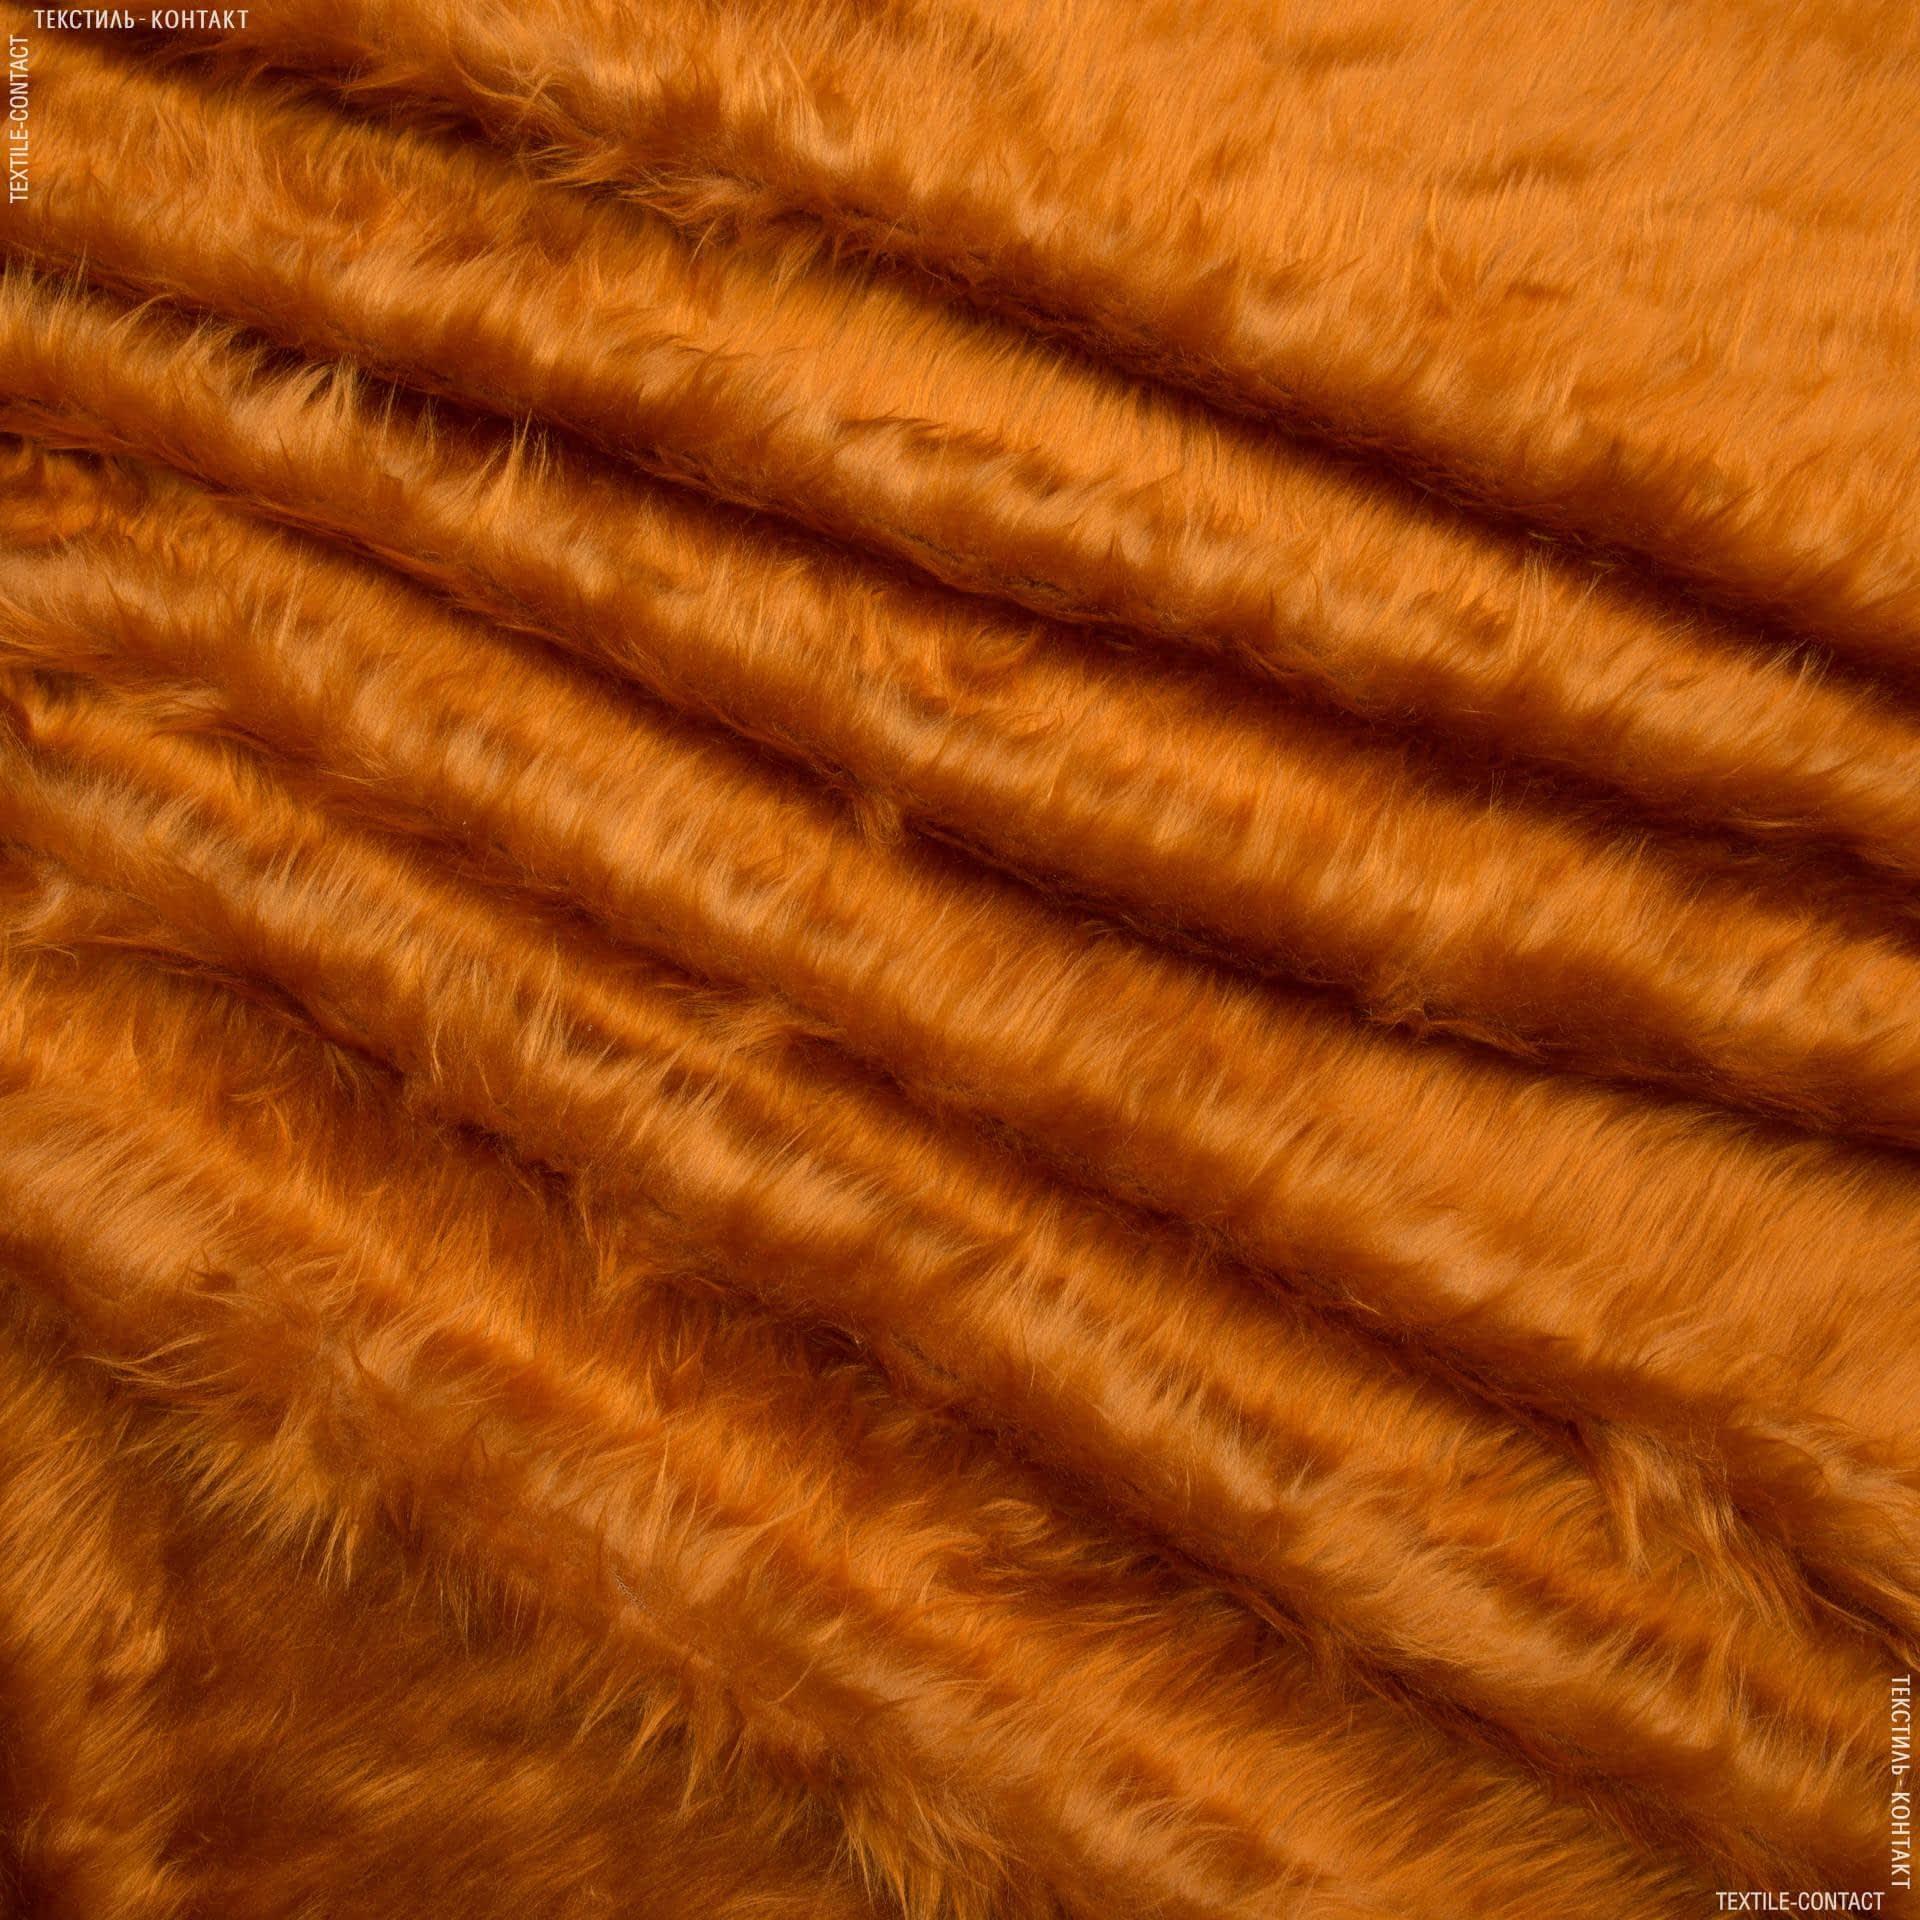 Тканини для верхнього одягу - Хутро штучне довговорсове коричневий